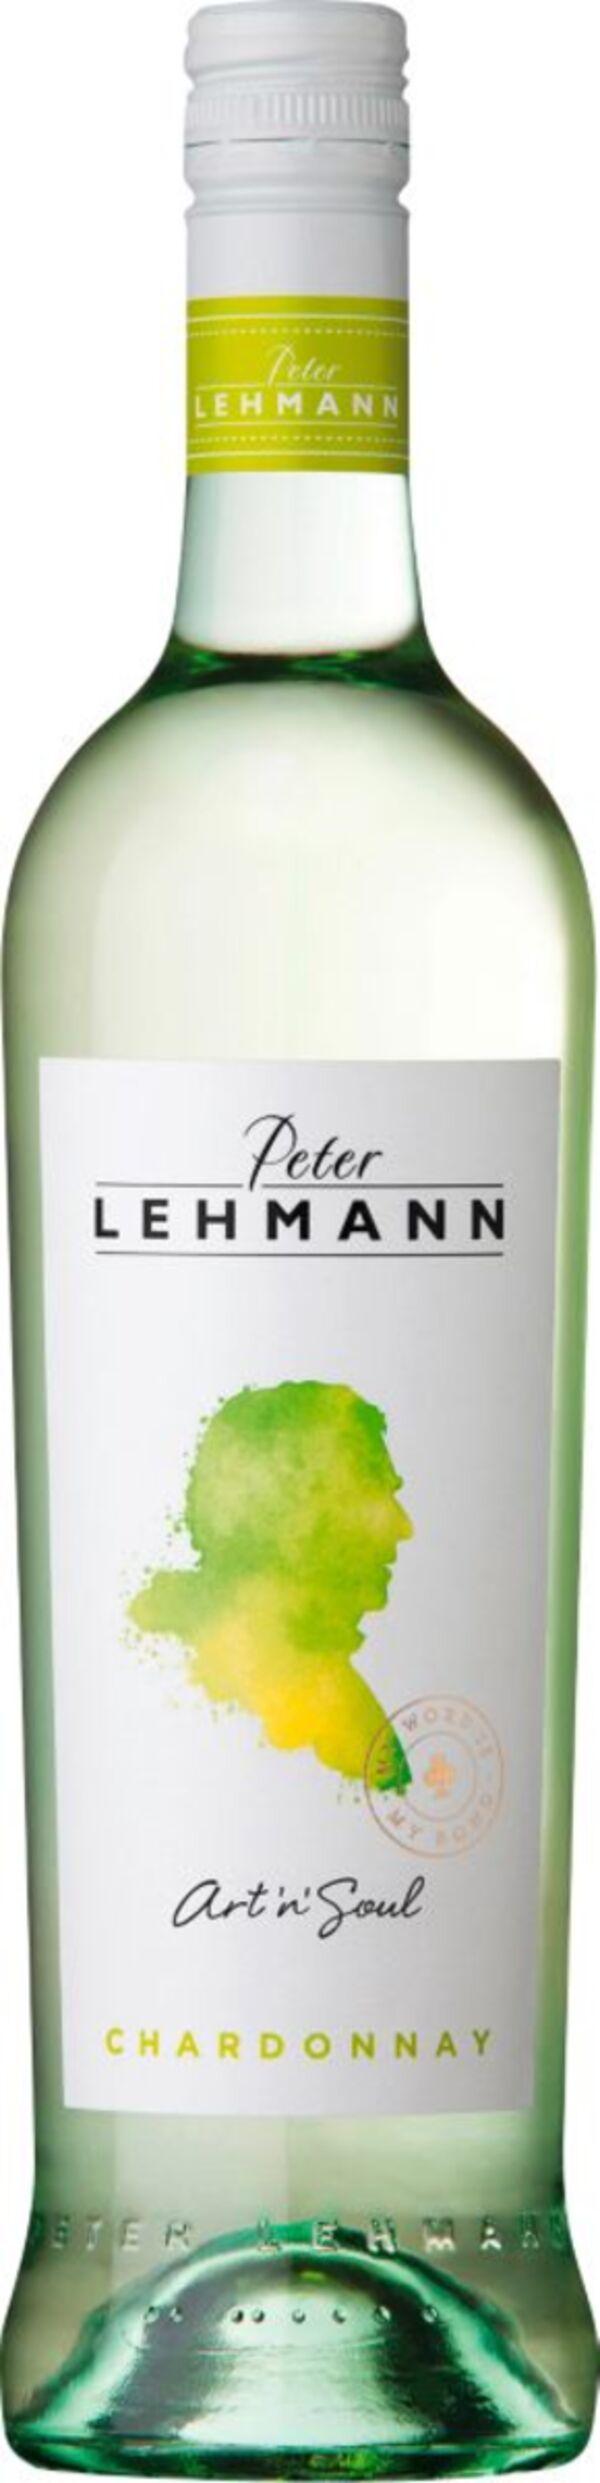 Peter Lehmann Barossa Chardonnay, 0,75l